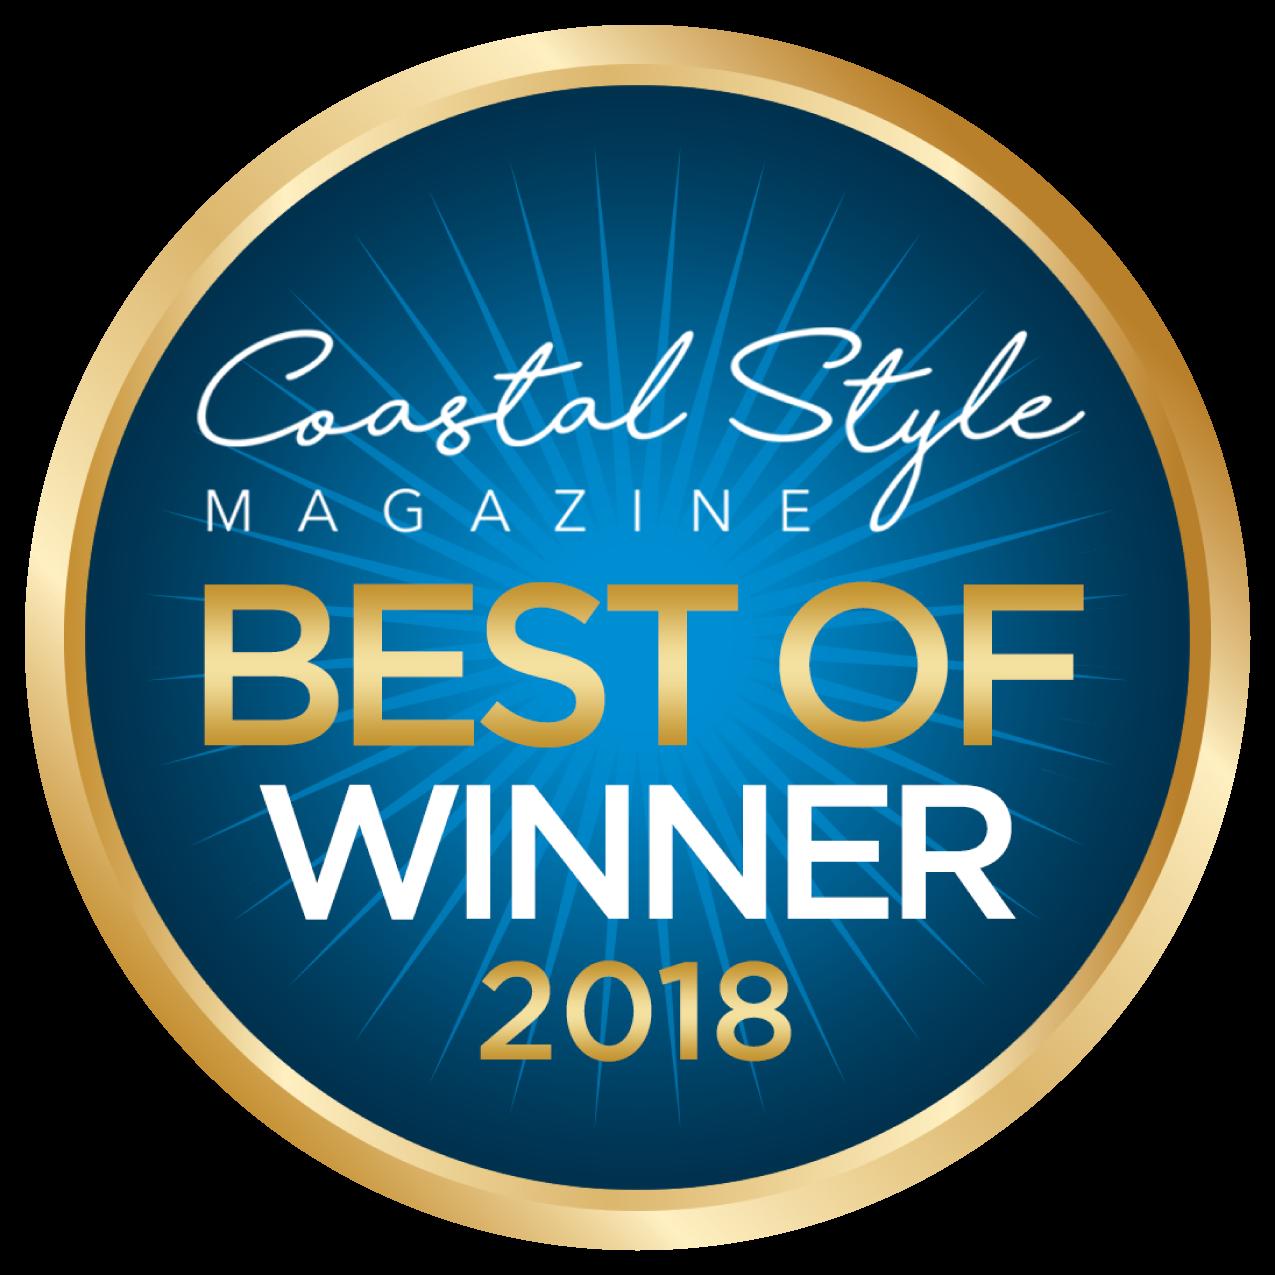 Coastal Style Magazine Best of Winner 2018 | Yoga Studio